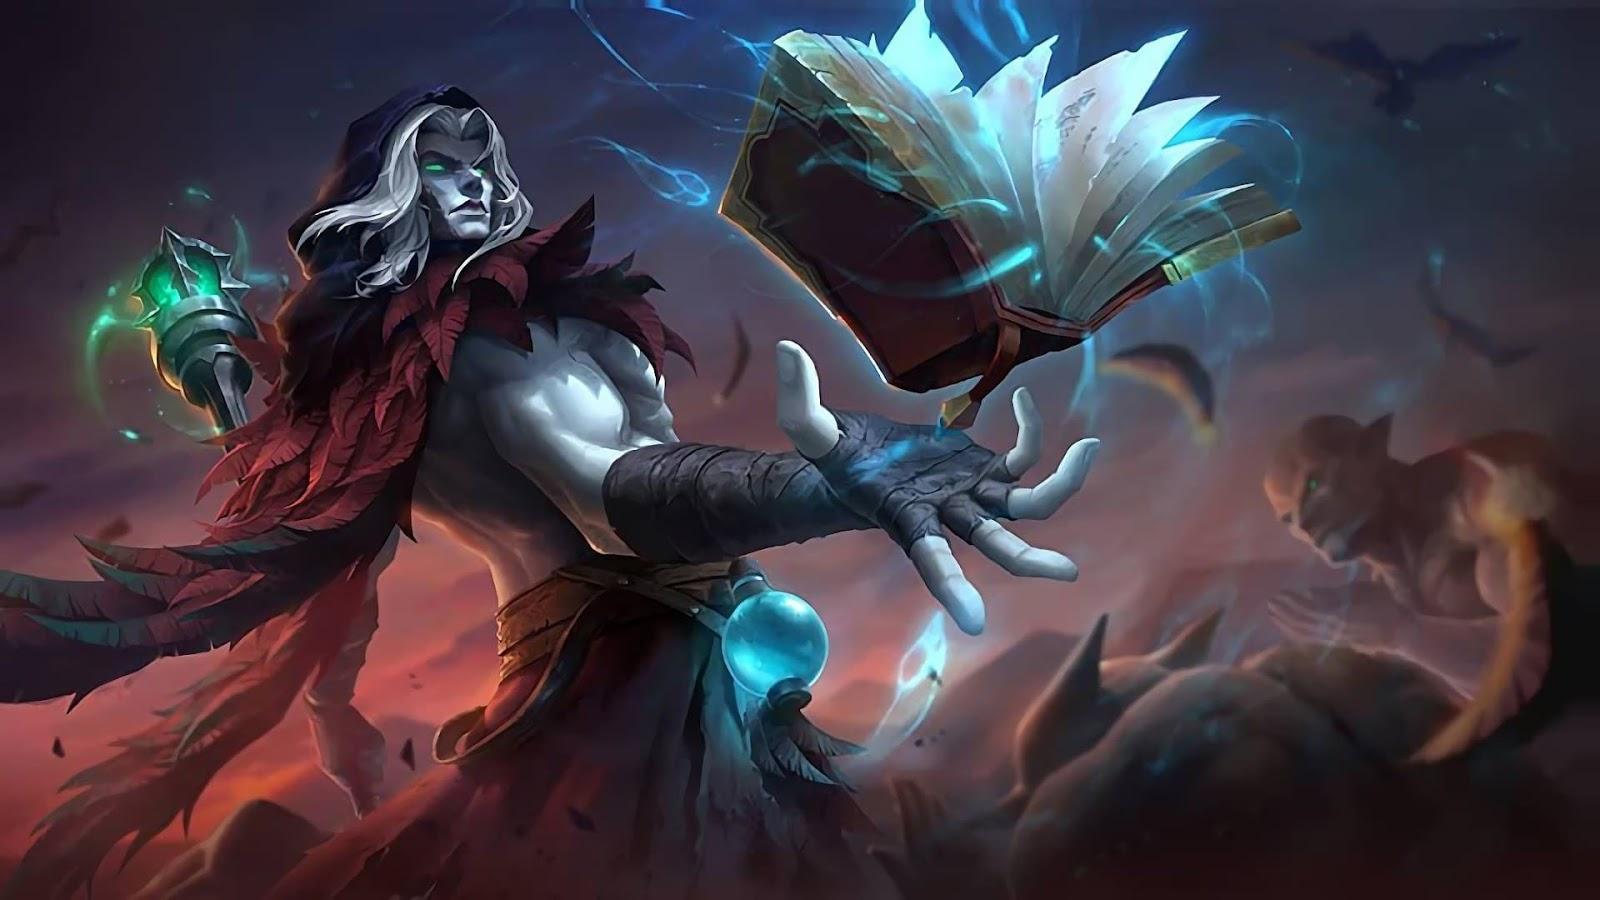 Wallpaper Faramis The Alchemist Skin Mobile Legends HD for PC